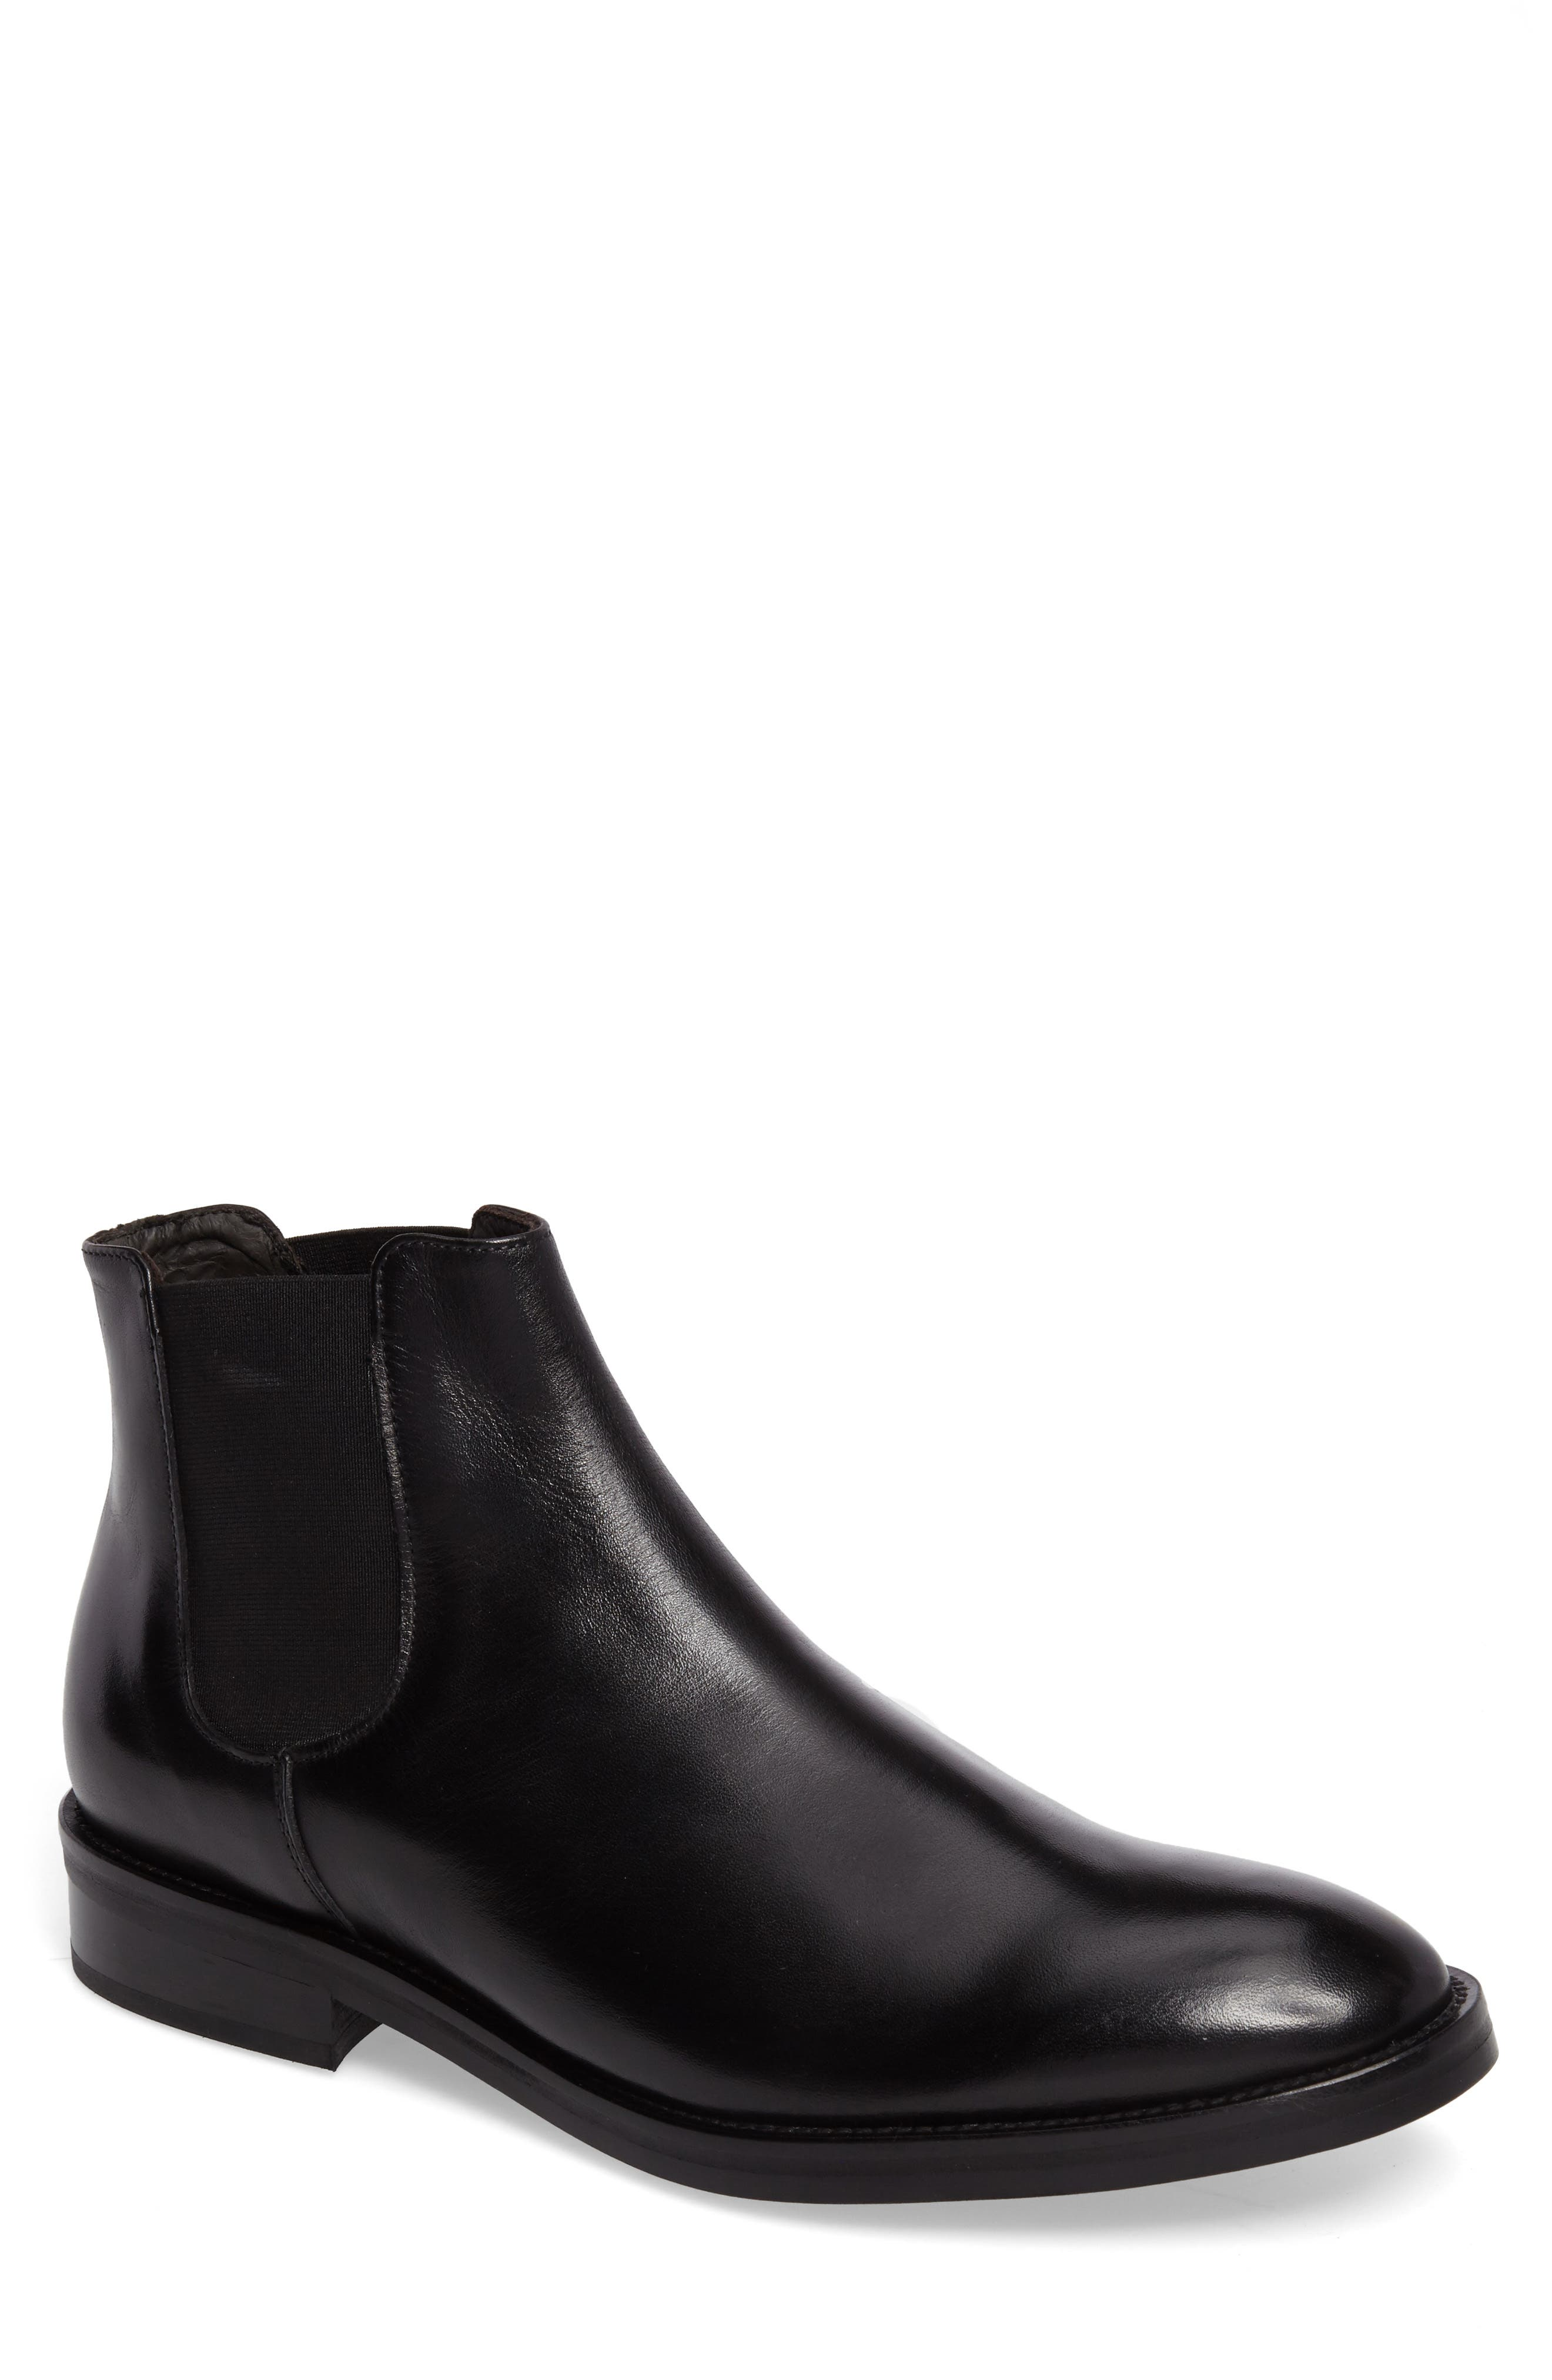 Finn Chelsea Boot,                         Main,                         color, 001